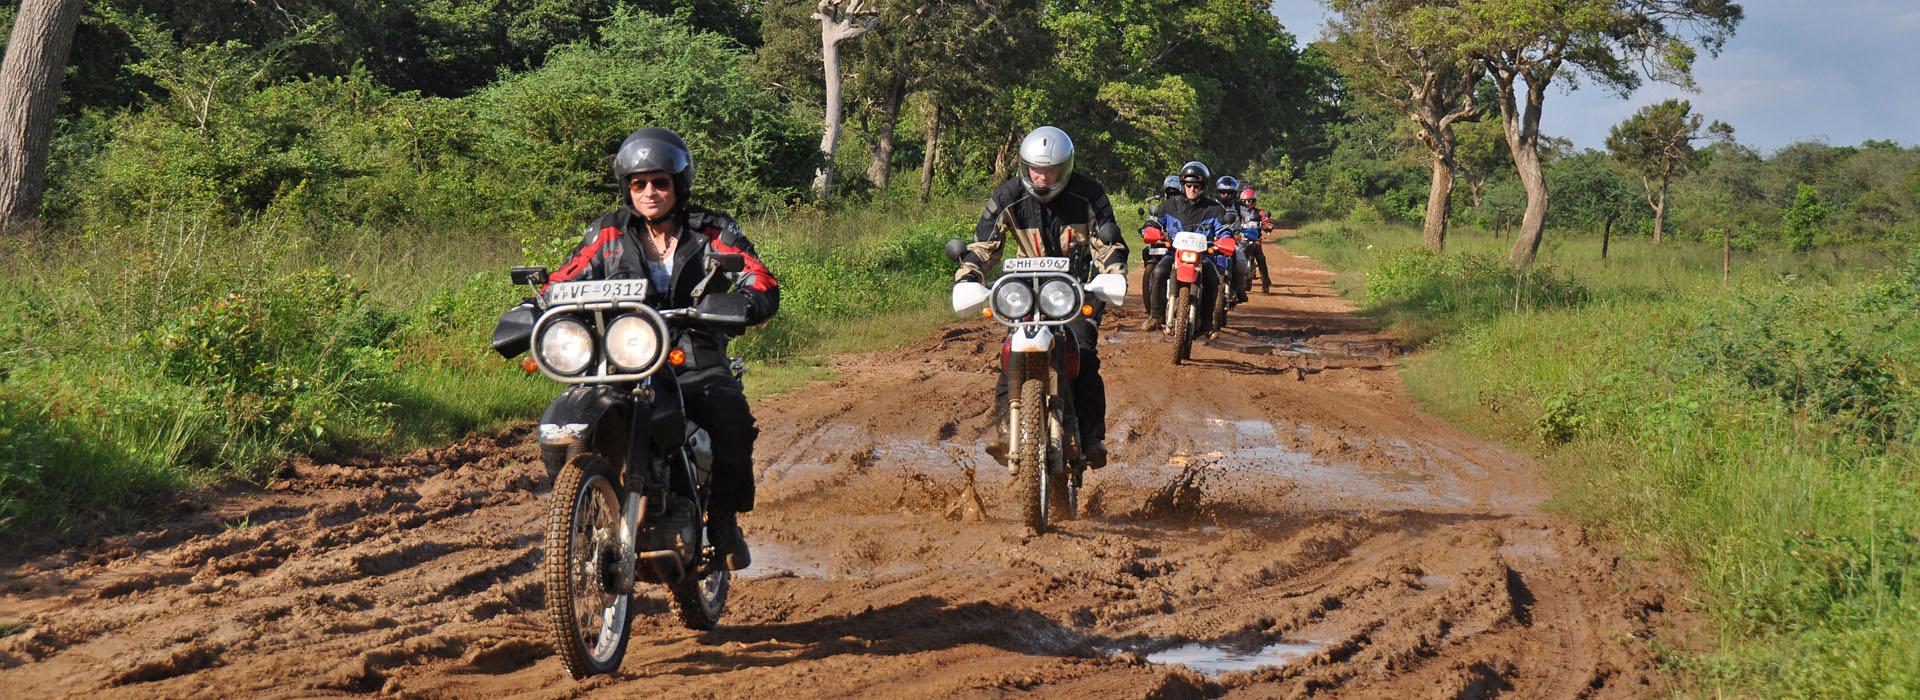 motorreis Sria Lank van Travel 2 Explore motorreizen